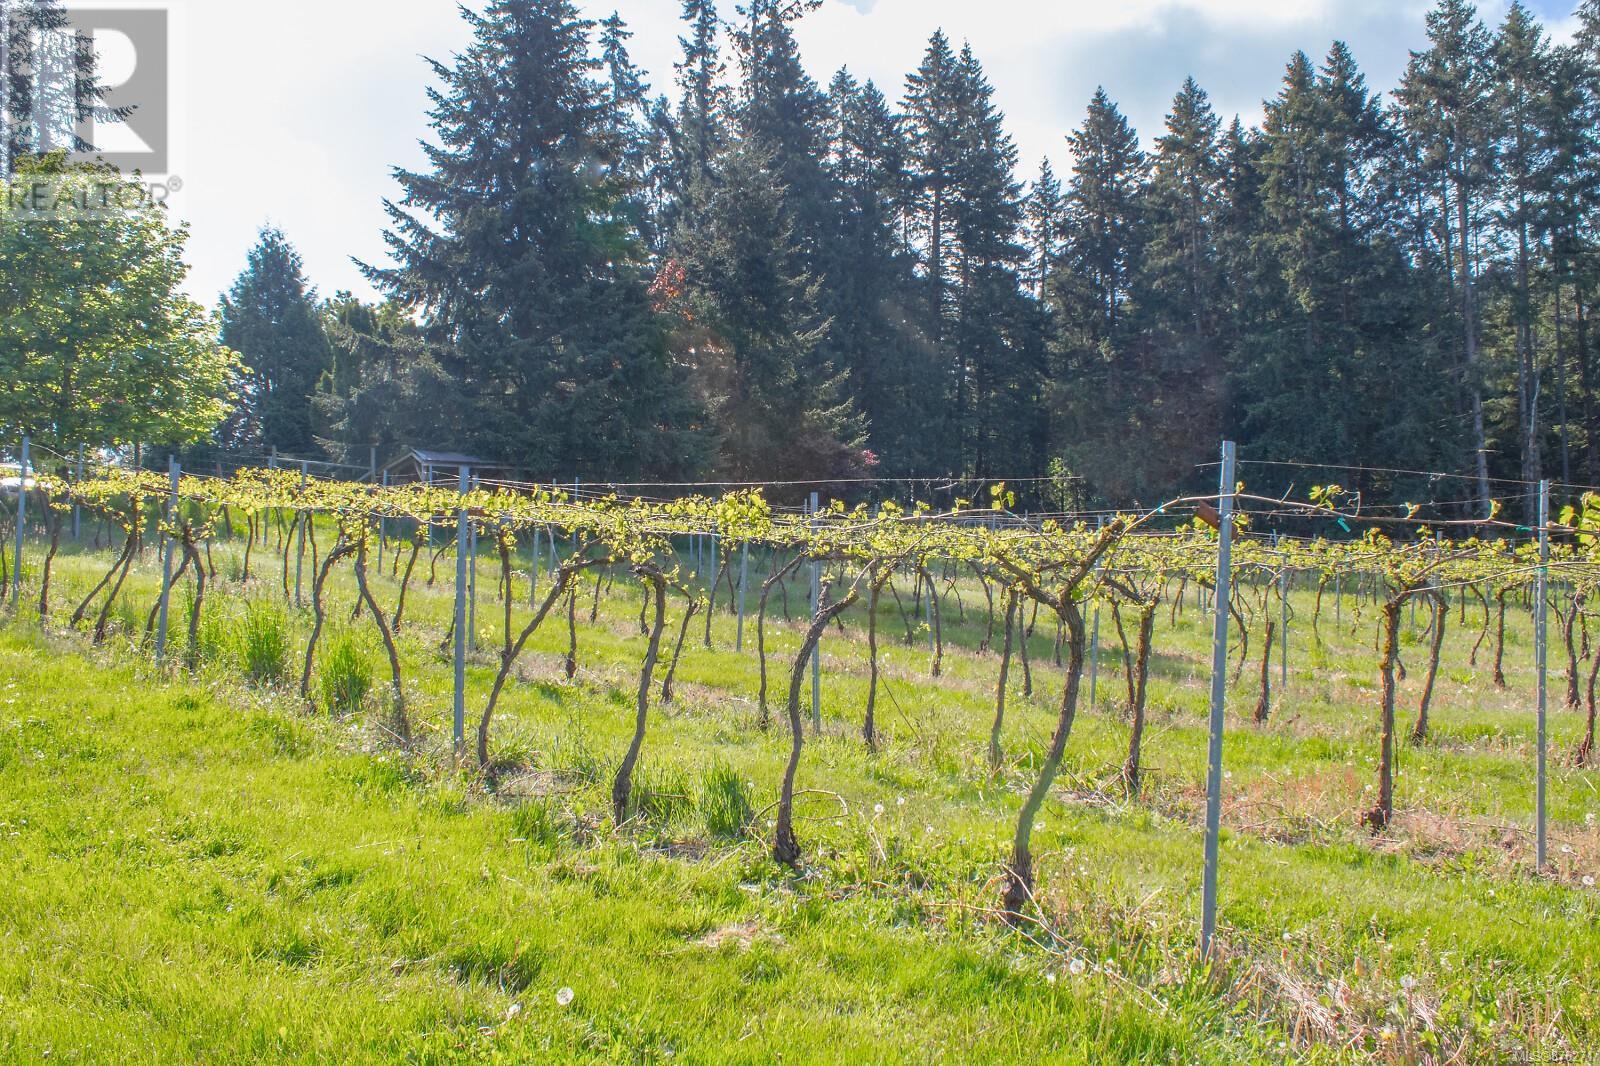 1854 Myhrest RdCobble Hill, British Columbia  V0R 1N1 - Photo 3 - 876271